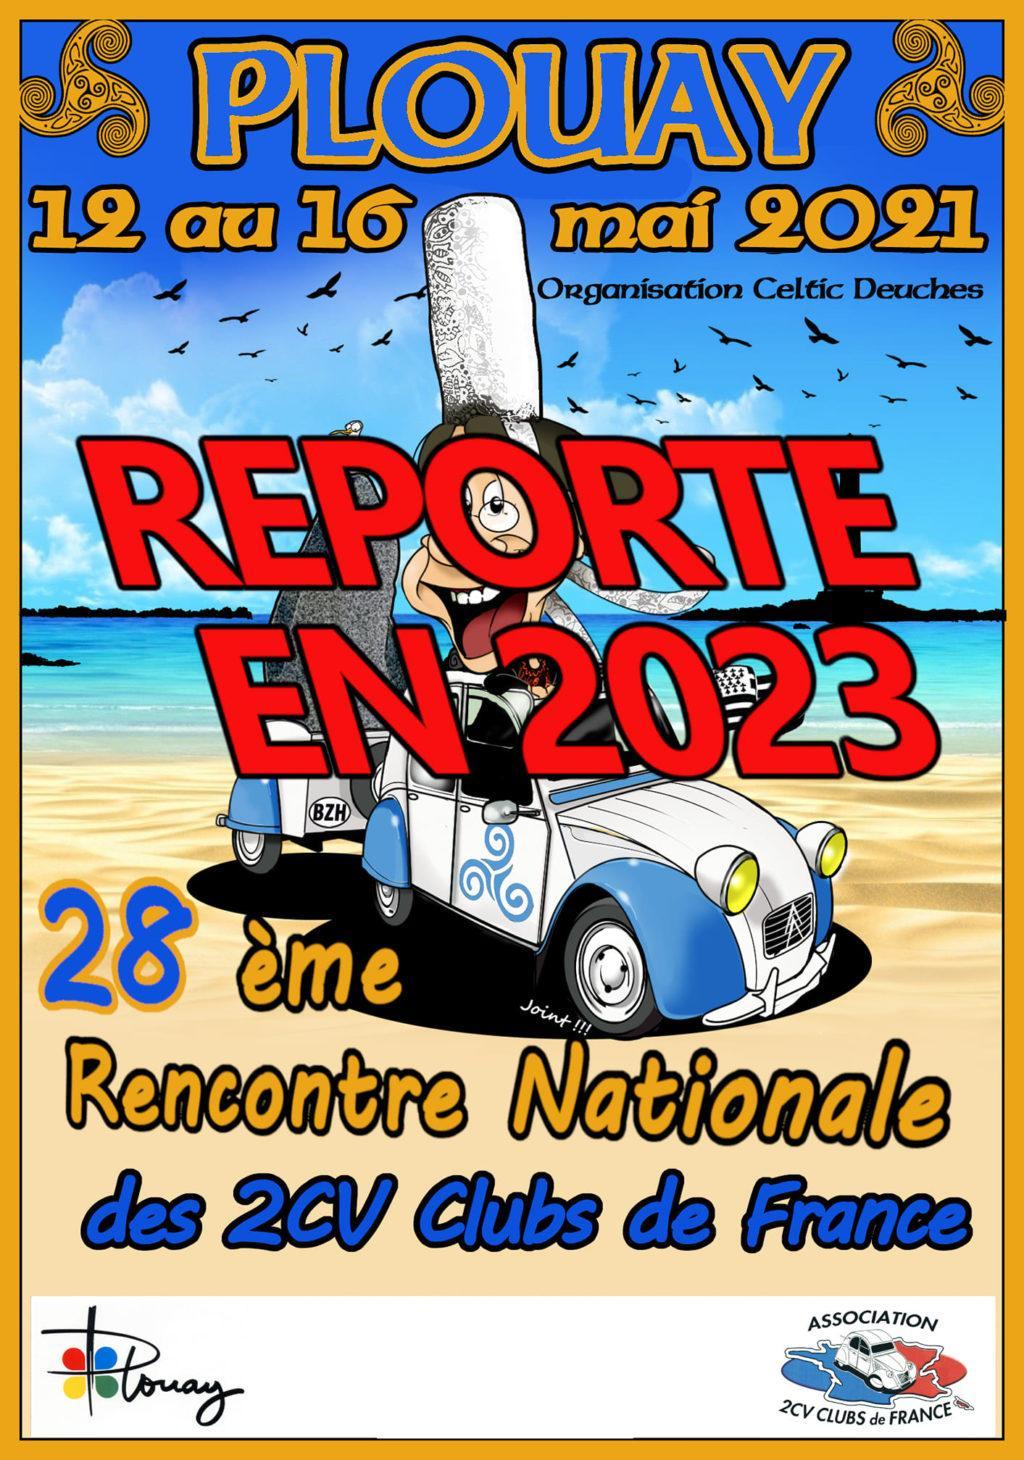 Plouay 2cv nationale reporte 1024x1460